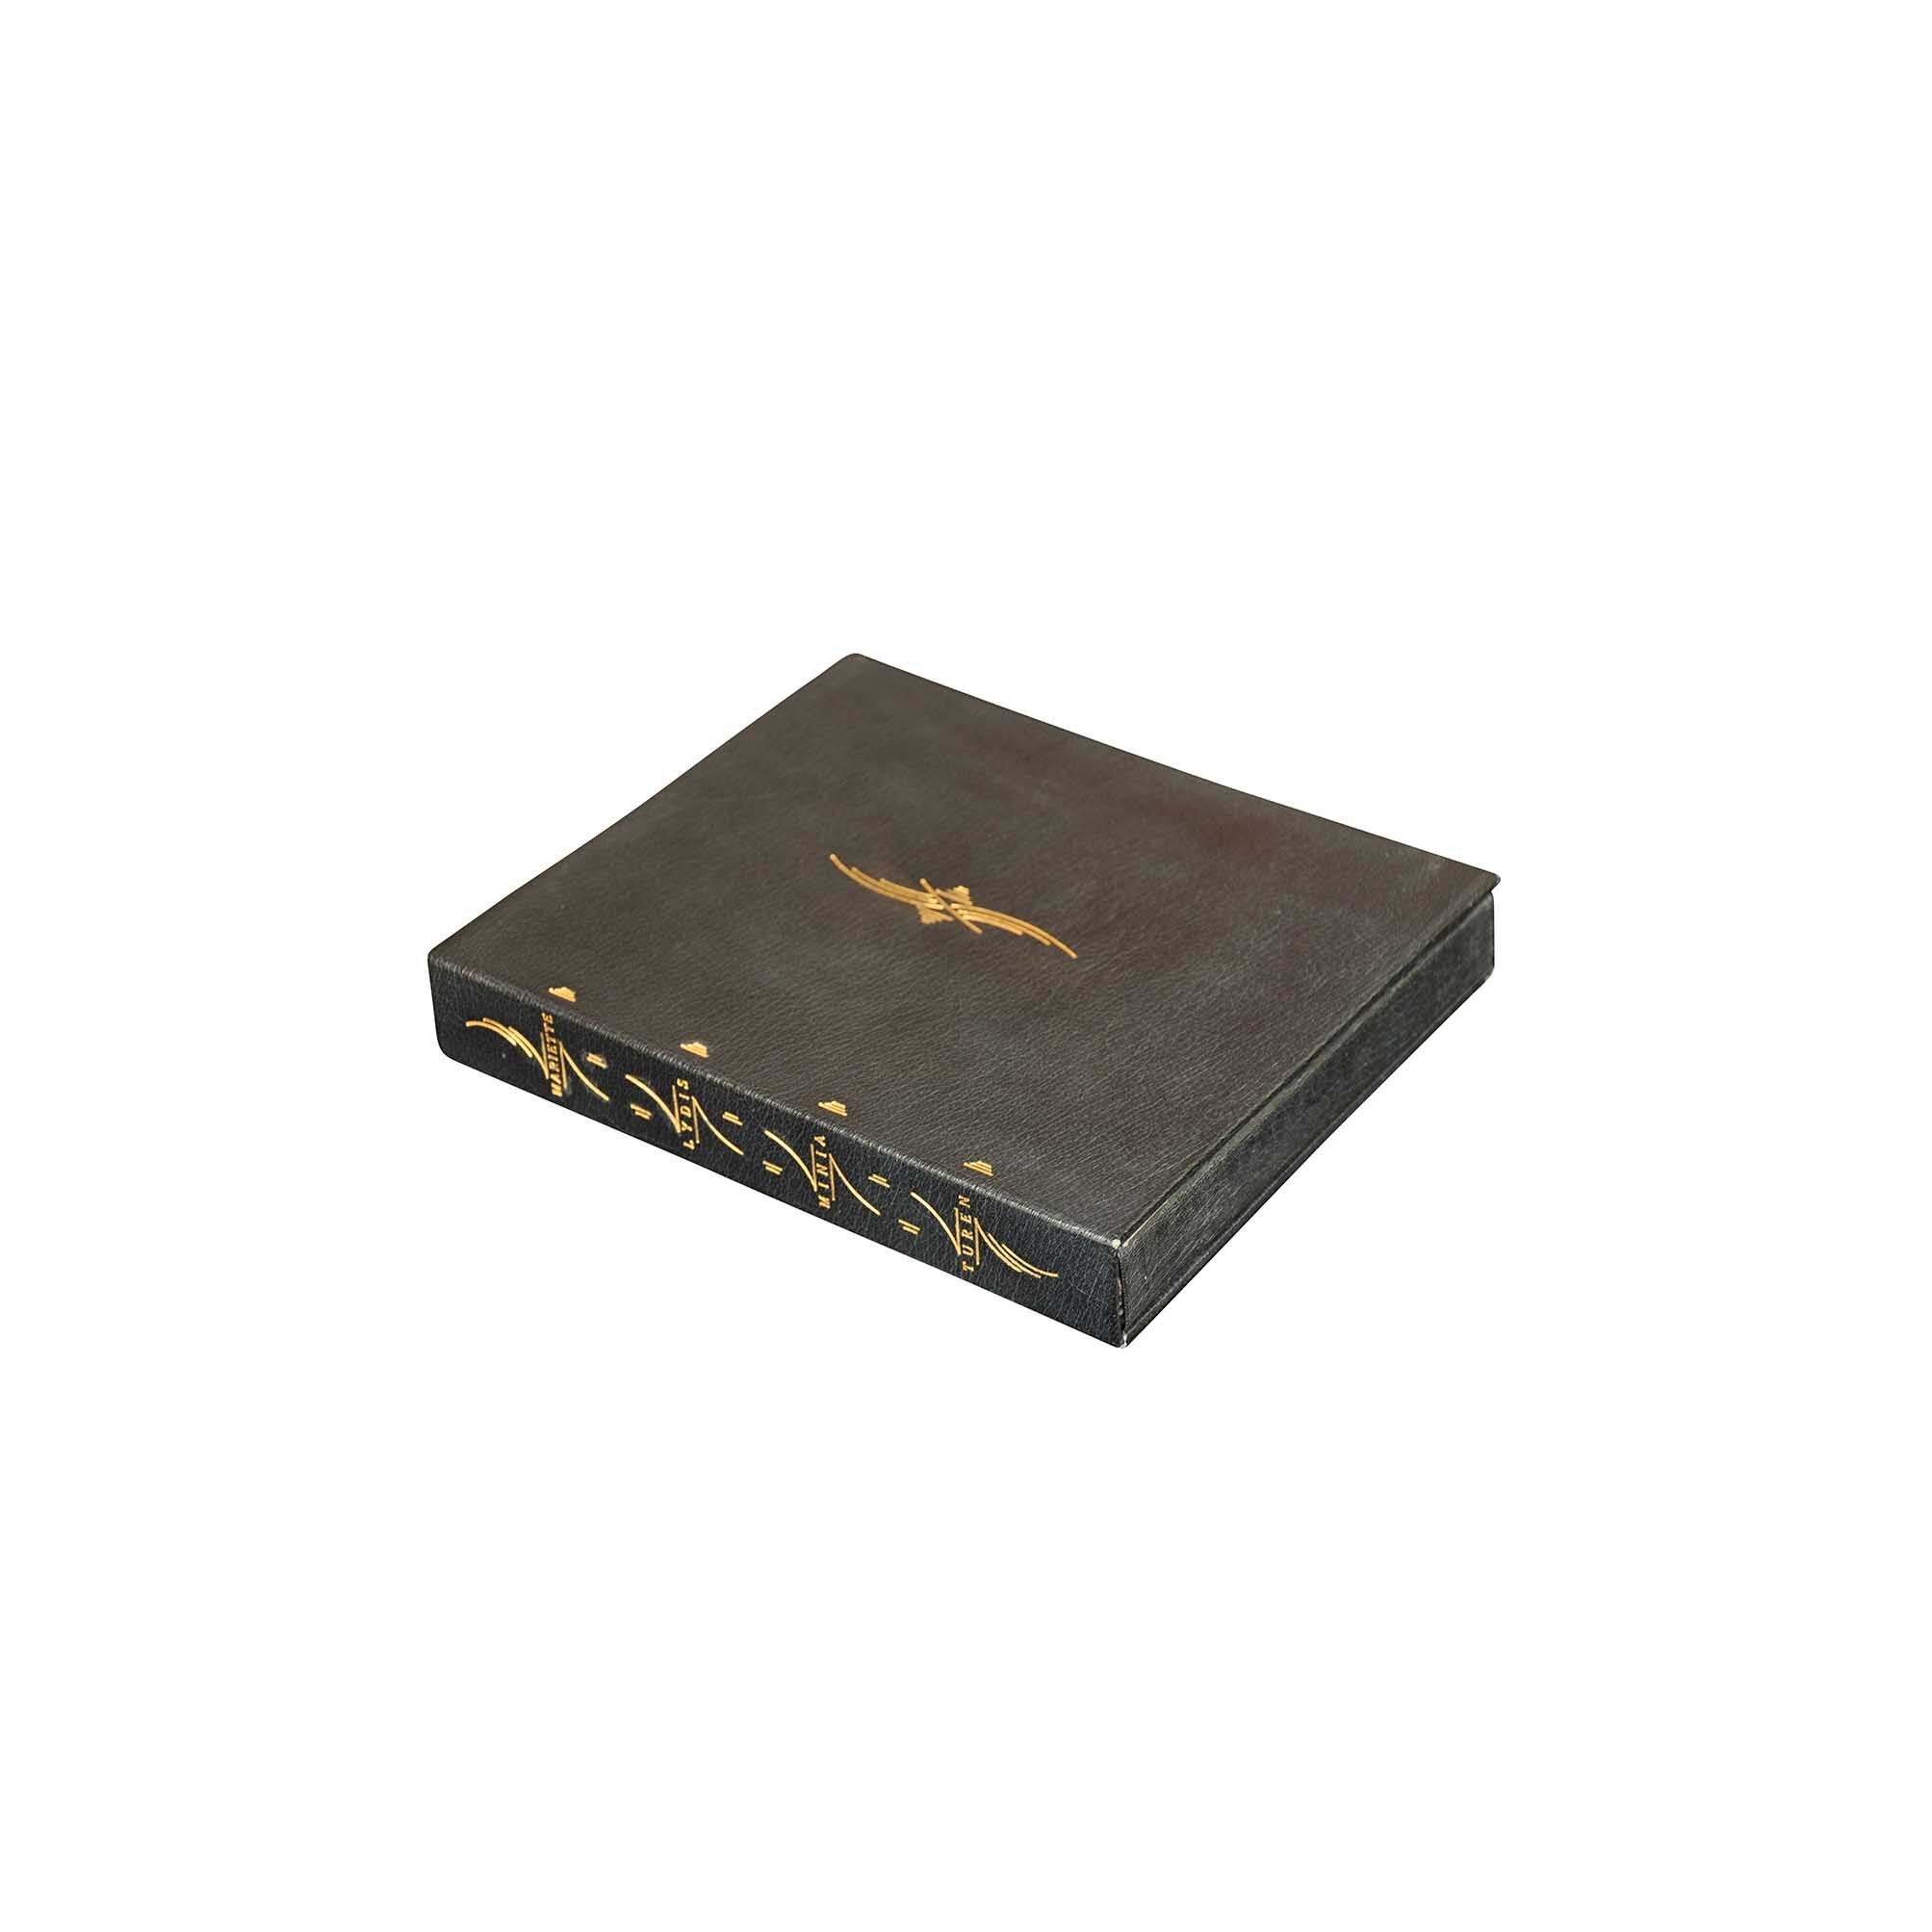 5699 Lydis Minaturen Luxury Edition 1924 Binding N